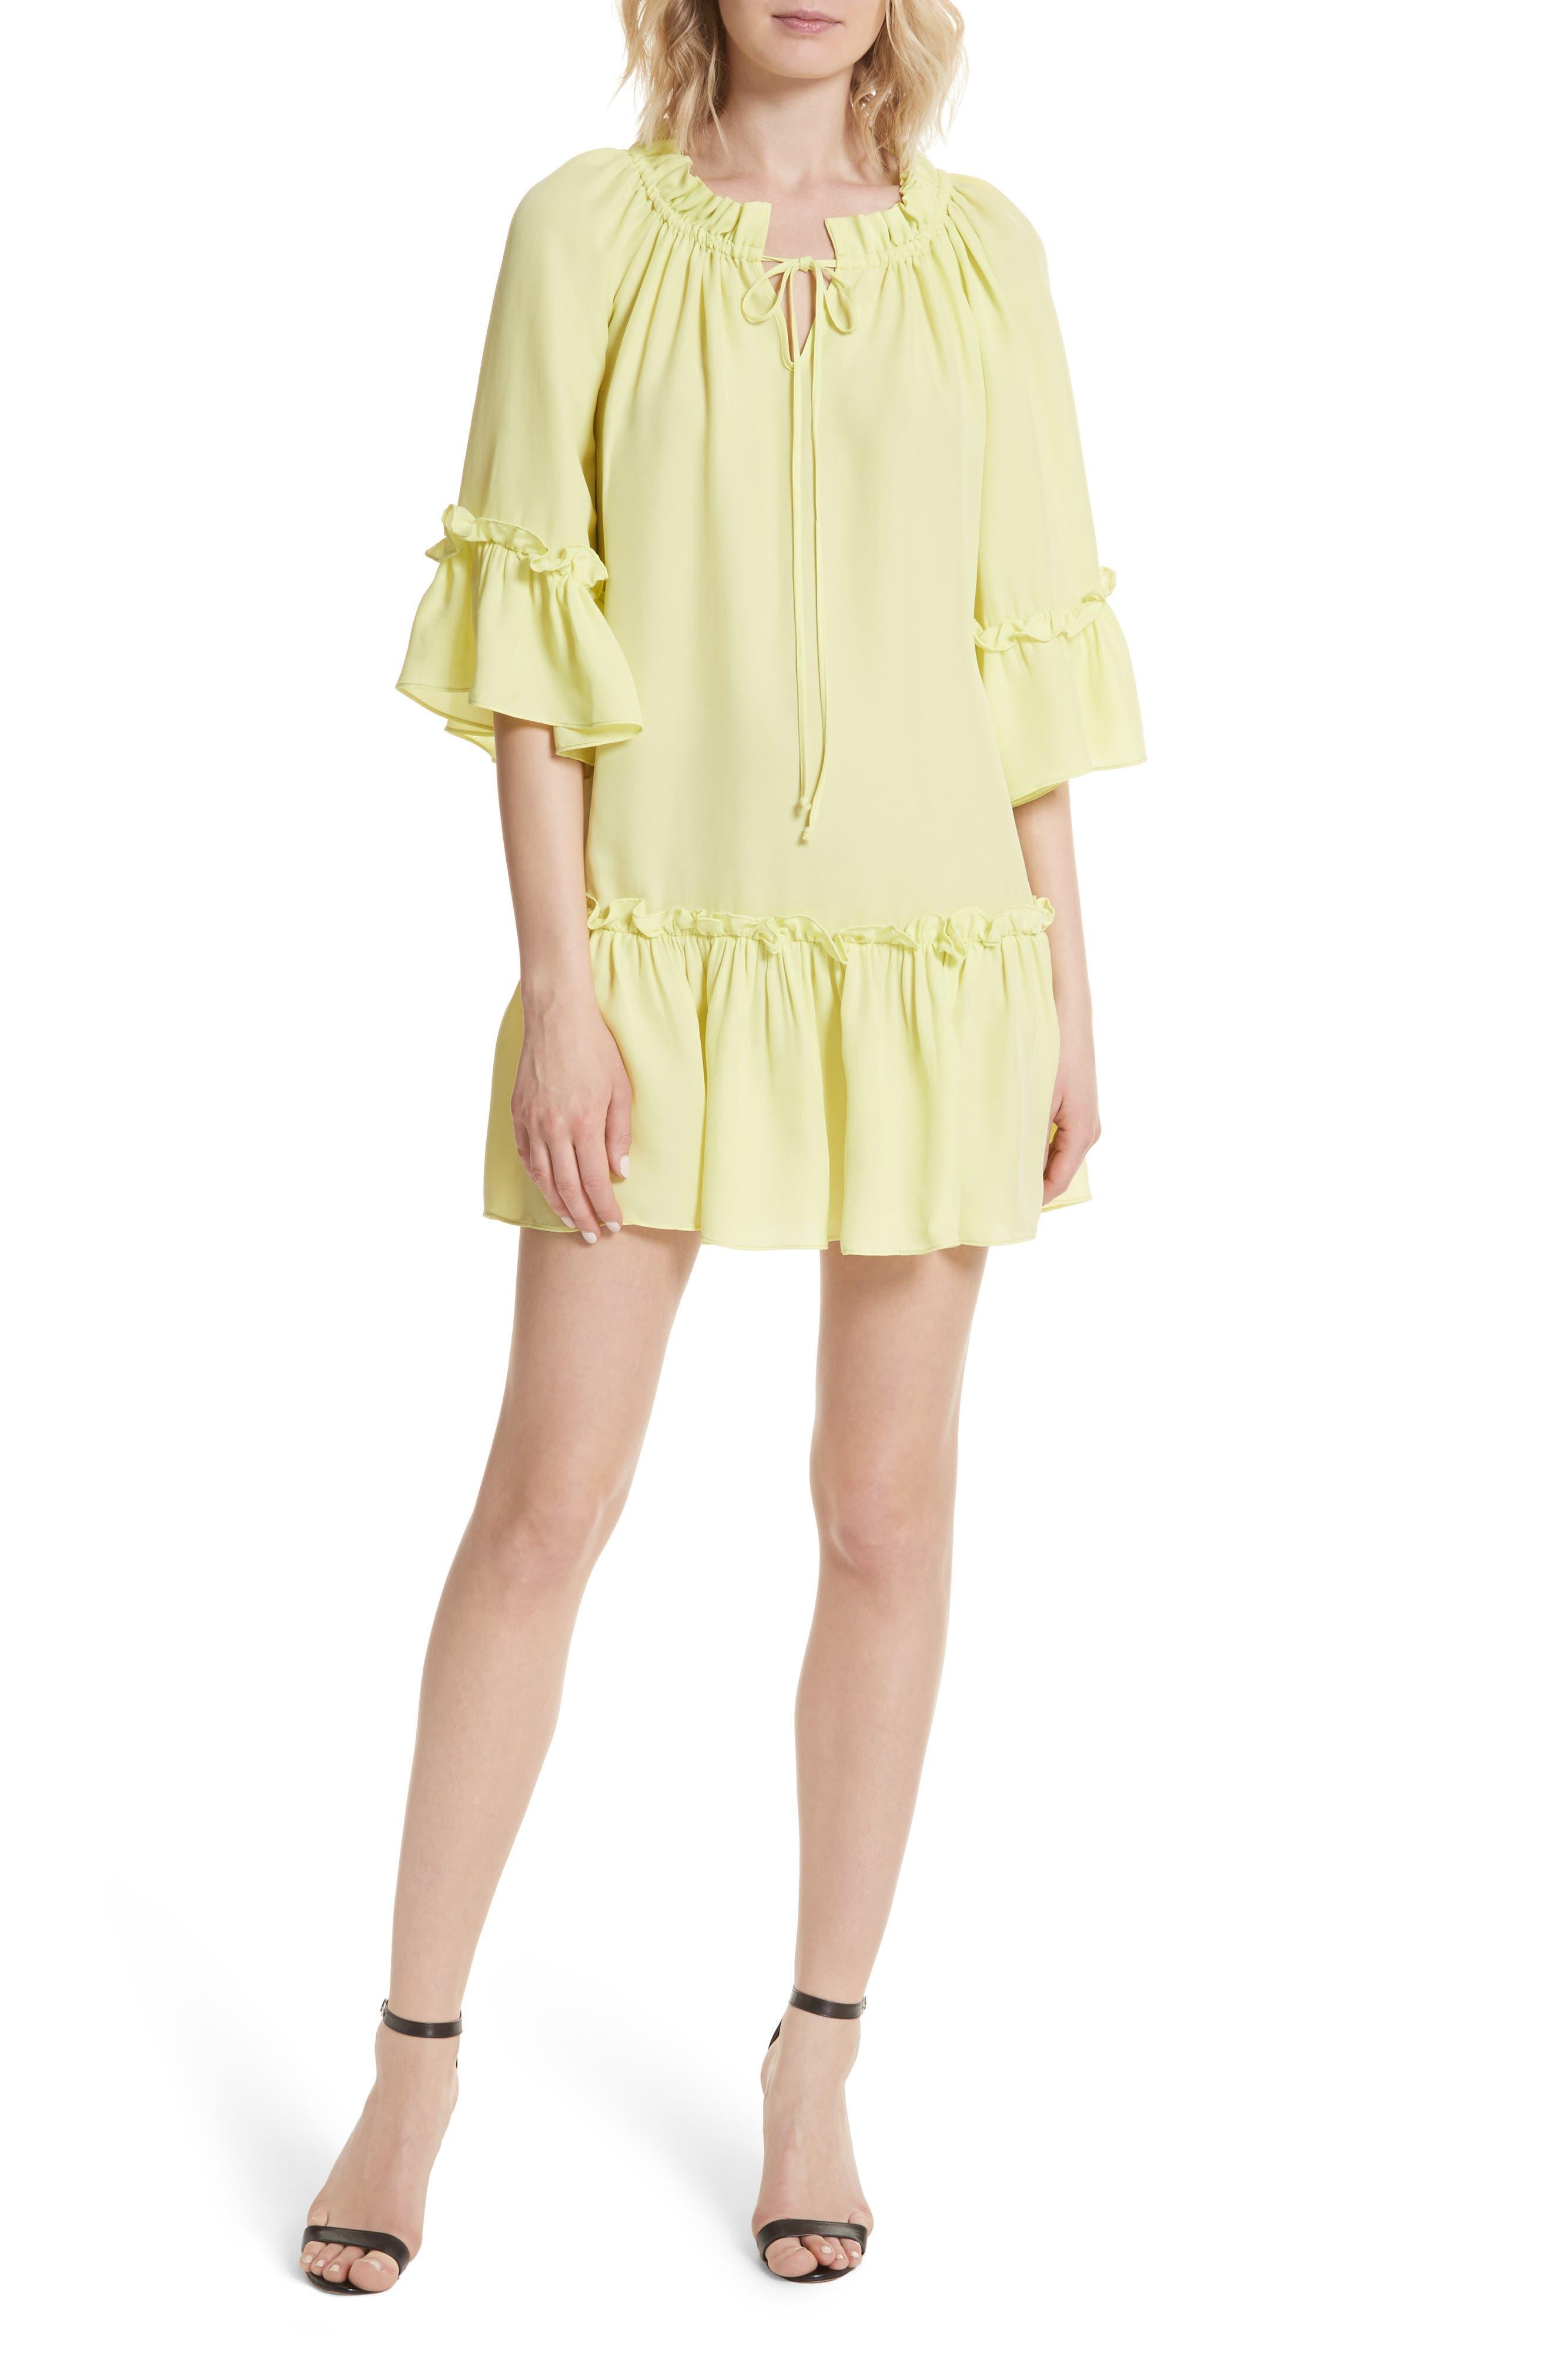 Santorini Ruffle Mini Dress,                             Main thumbnail 1, color,                             Lemon Yellow